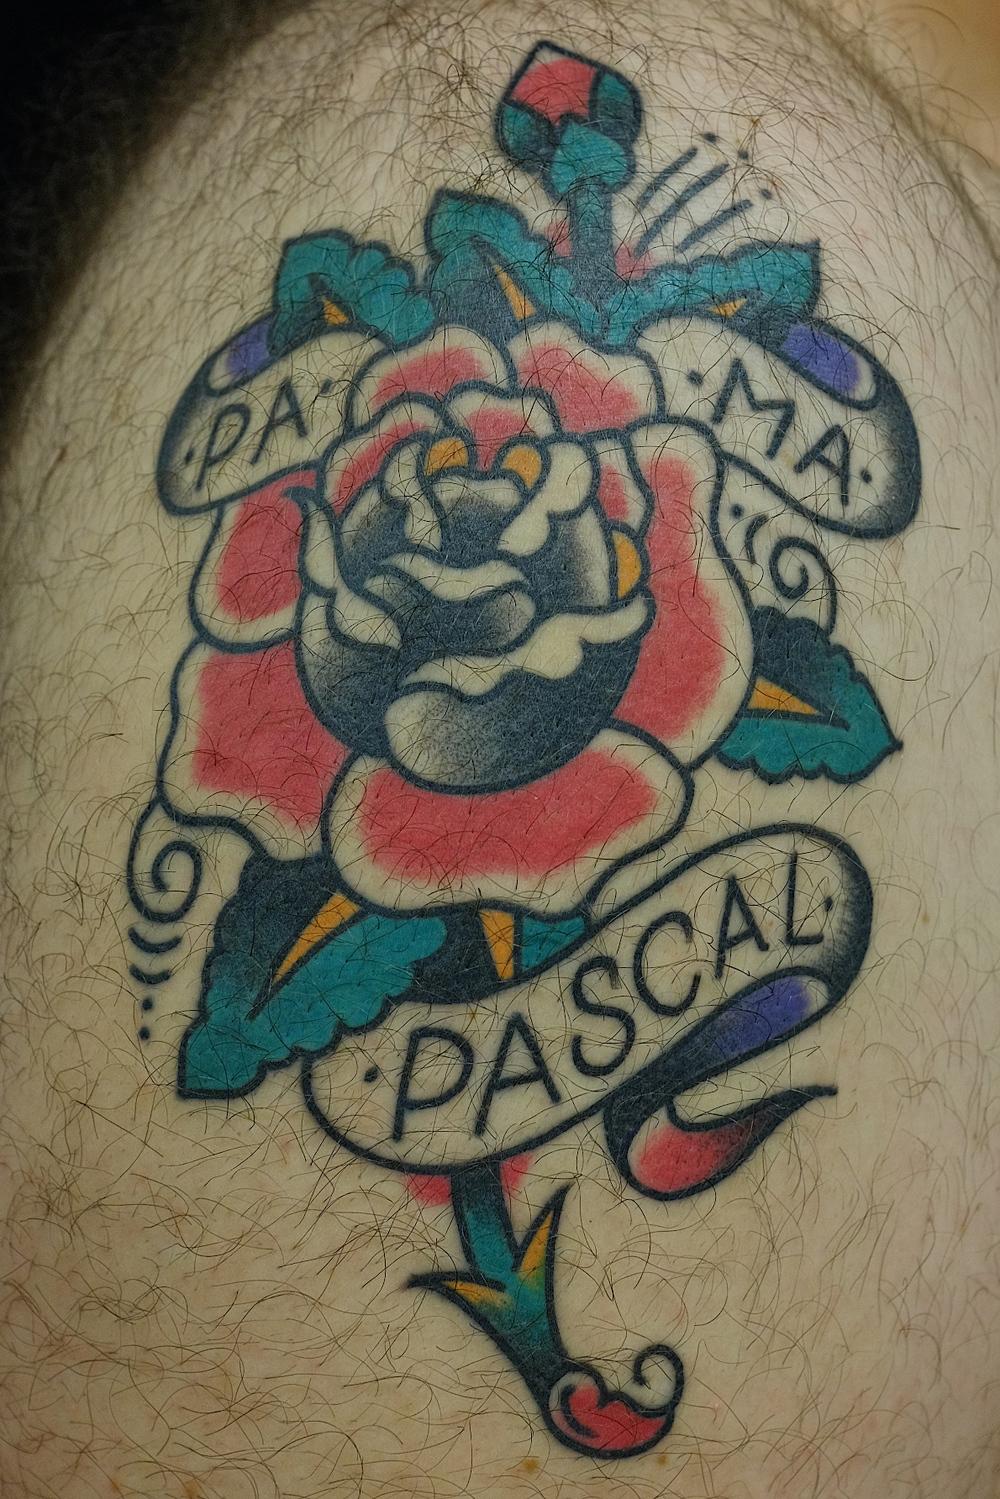 01082013 Tattoos 31 17.jpg